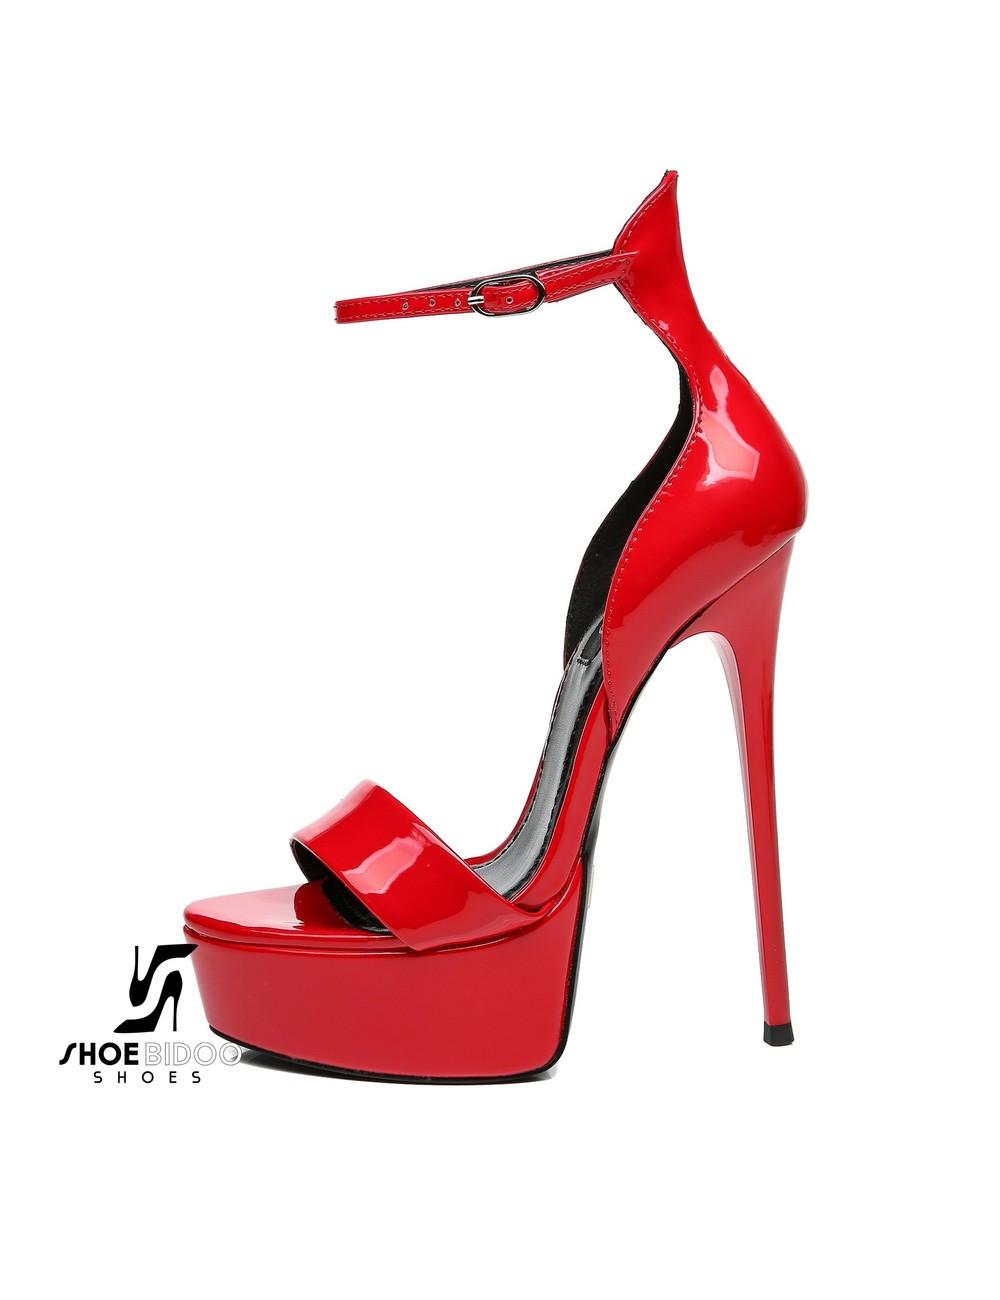 Giaro Rode glanzende Giaro MINA sandalen met hoge enkelriem